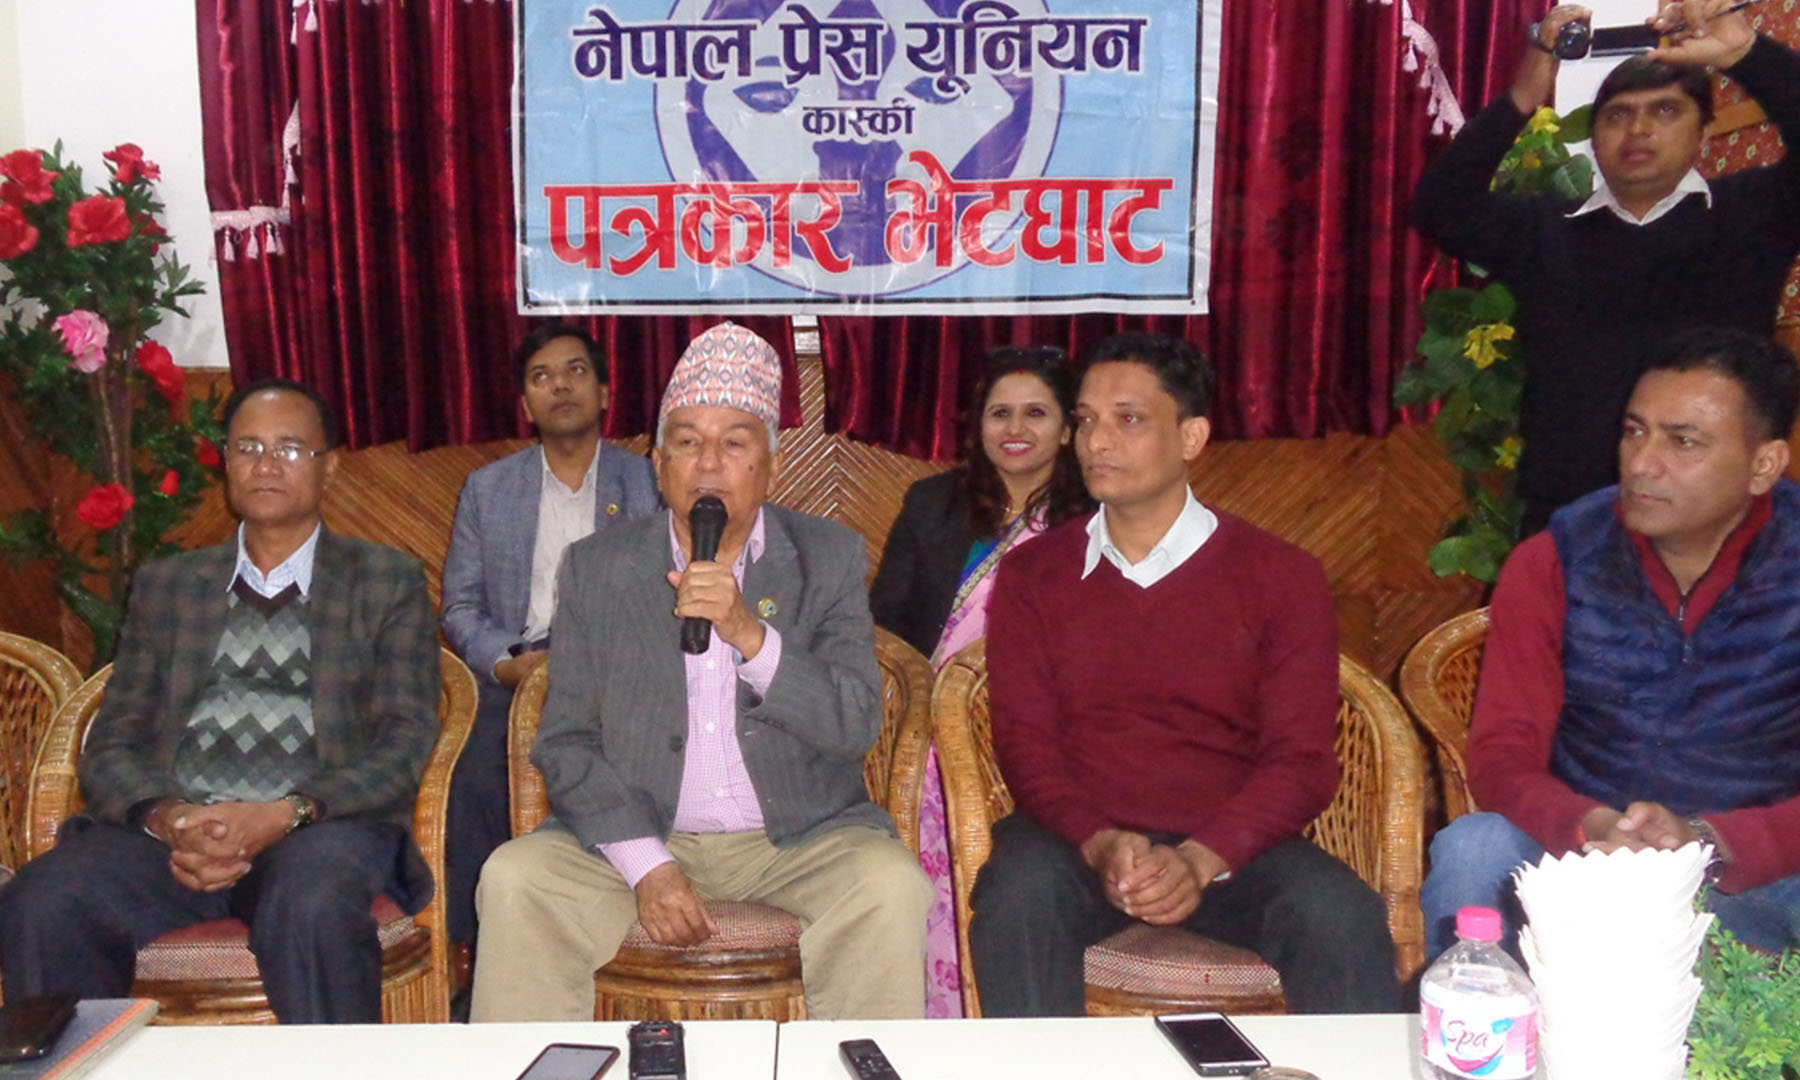 चुनावलाई प्रभावित पारिनु हुन्न : वरिष्ठ  नेता पौडेल